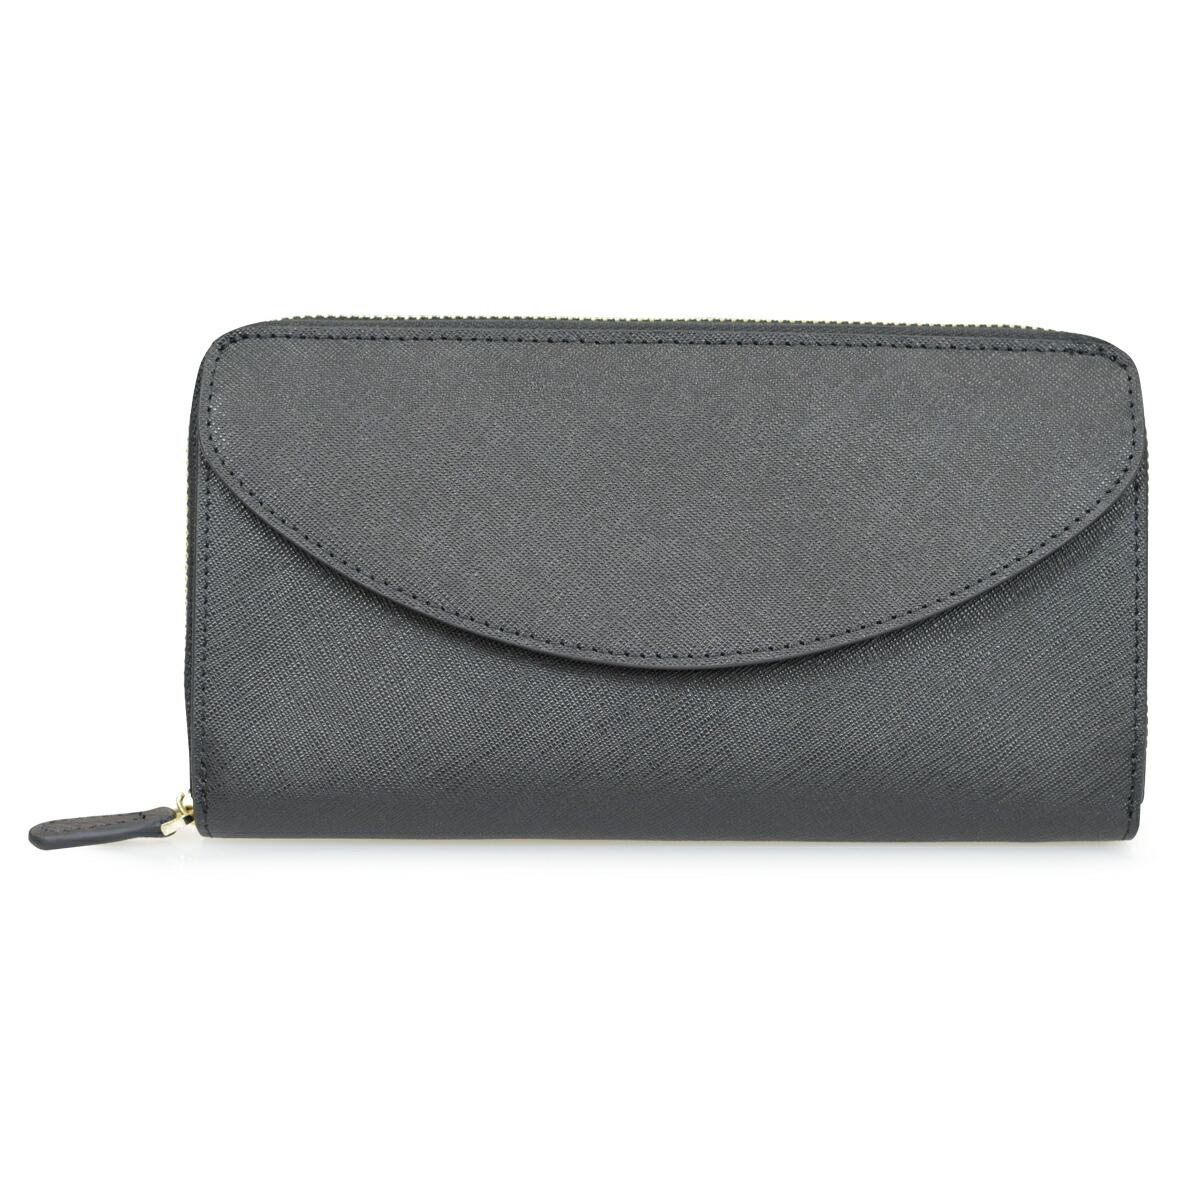 BARCOS サフィアーノレザー長財布 レディース 全3色 ONESIZE バルコス